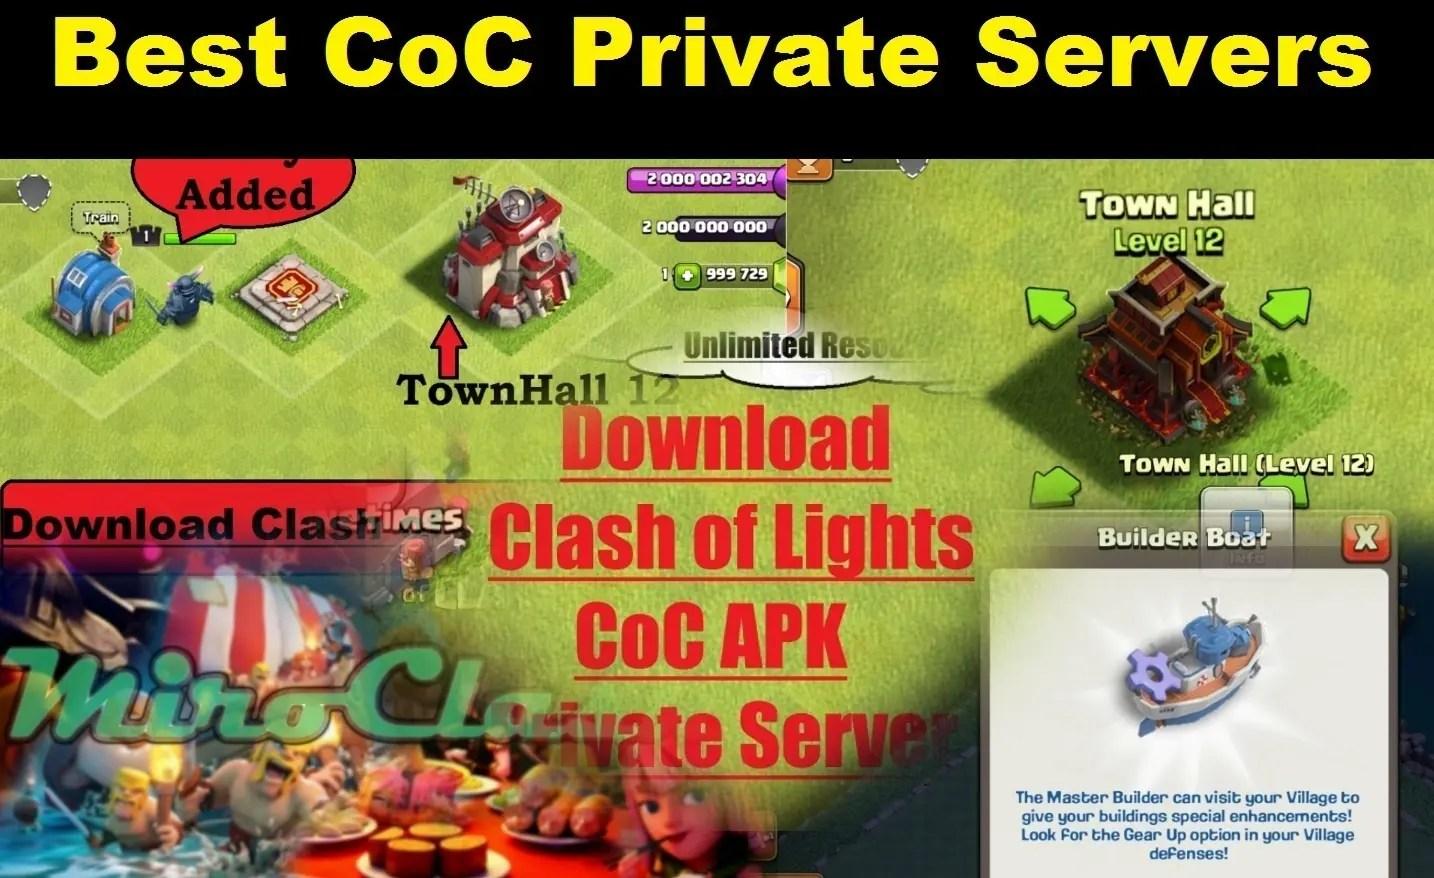 CoCPrivateServers_FoneTimes.com